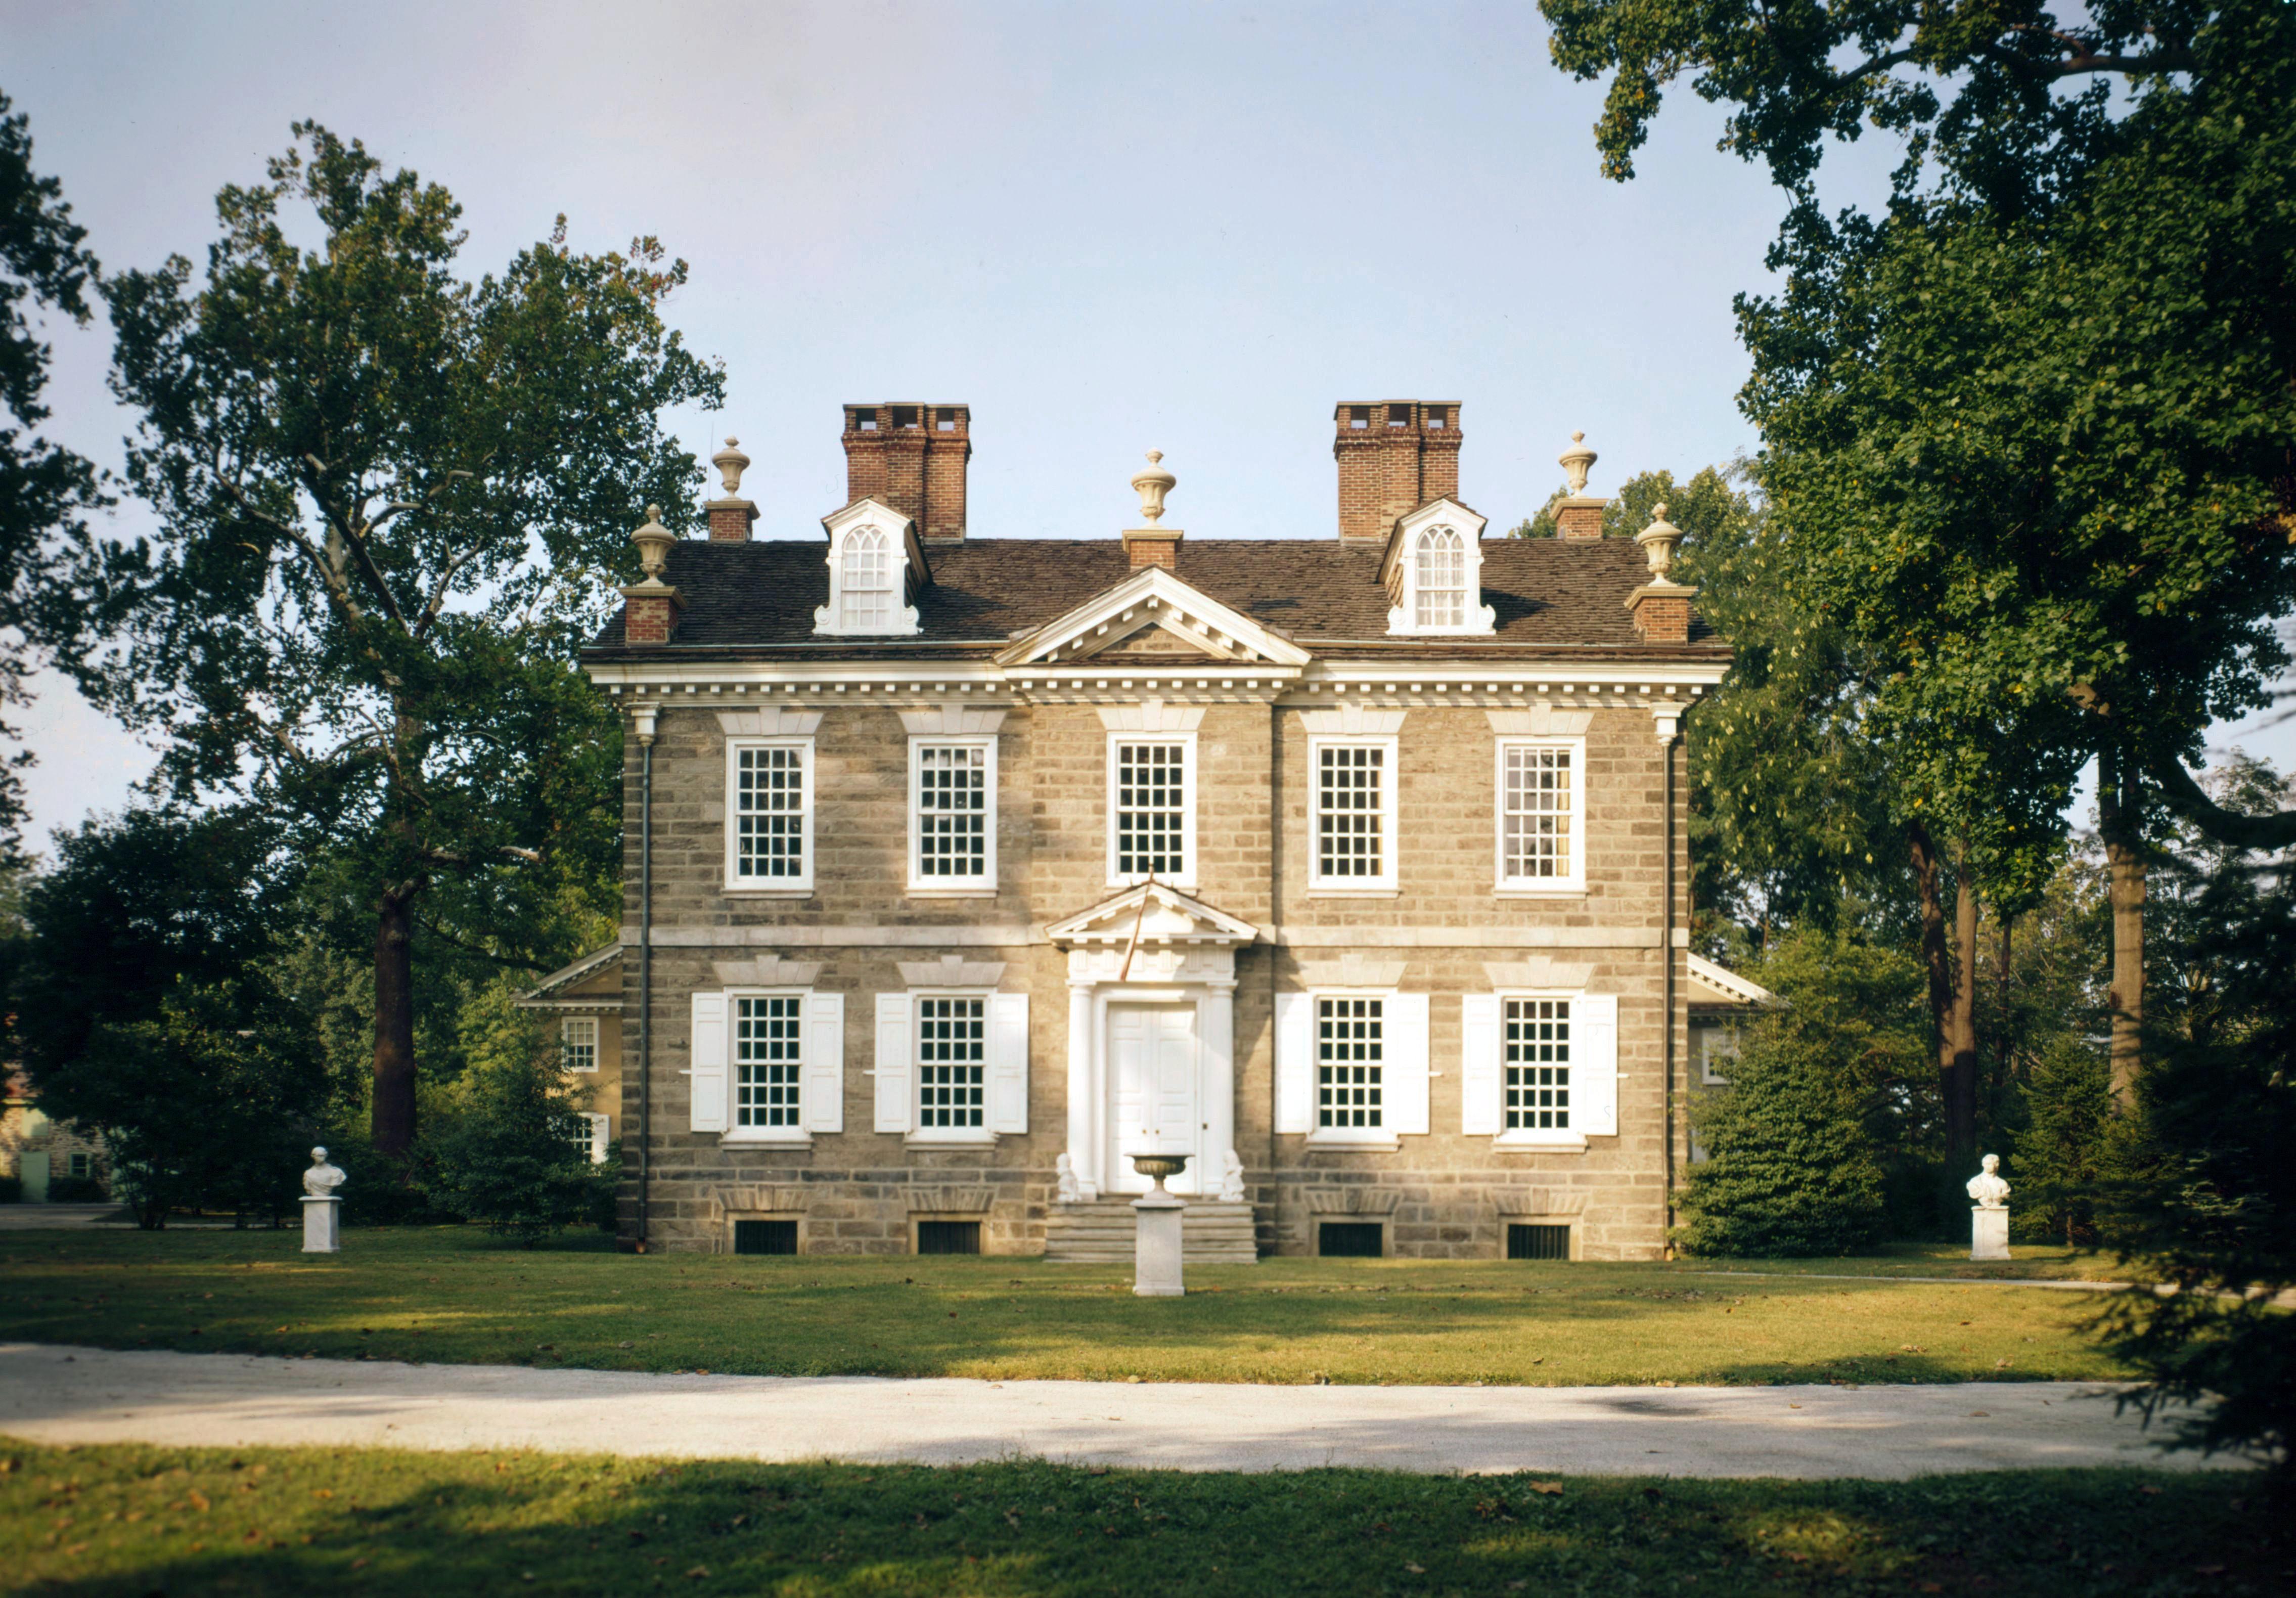 File:Cliveden Mansion, Philadelphia, HABS PA-1184-88.jpg - Wikimedia ...